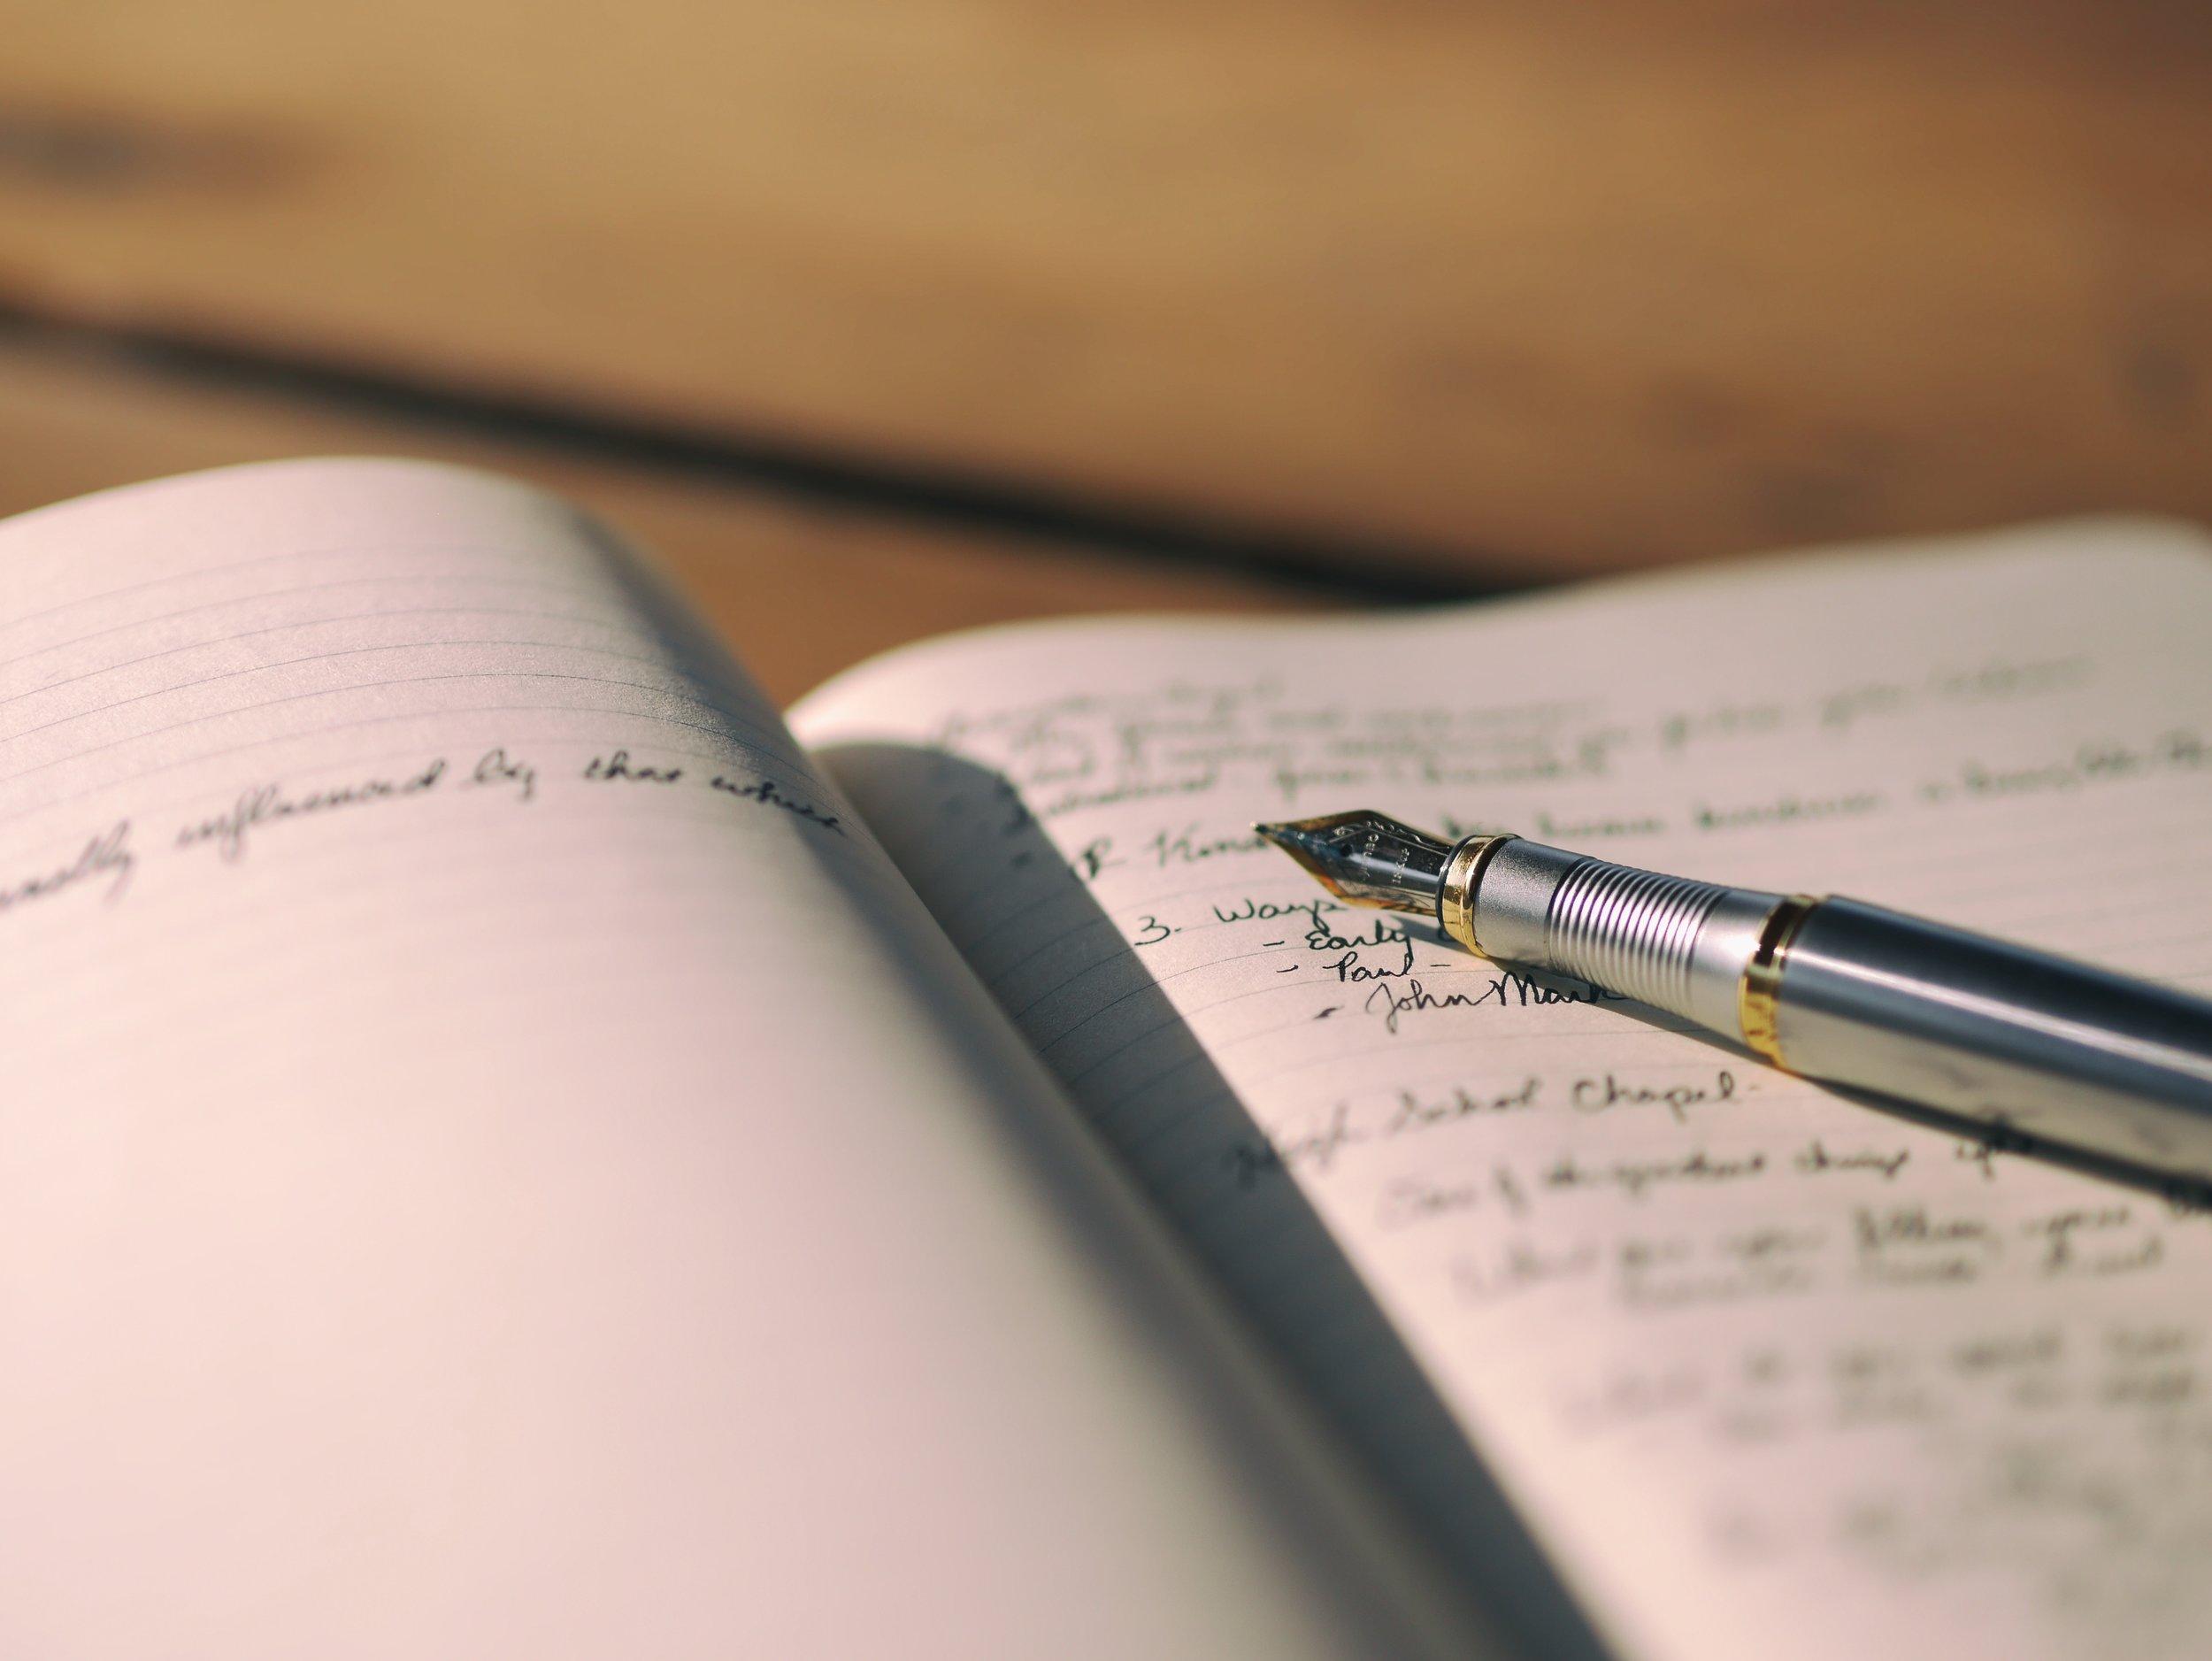 www.rrnoall.com-im-a-writer-denver-writer-rachel-noall